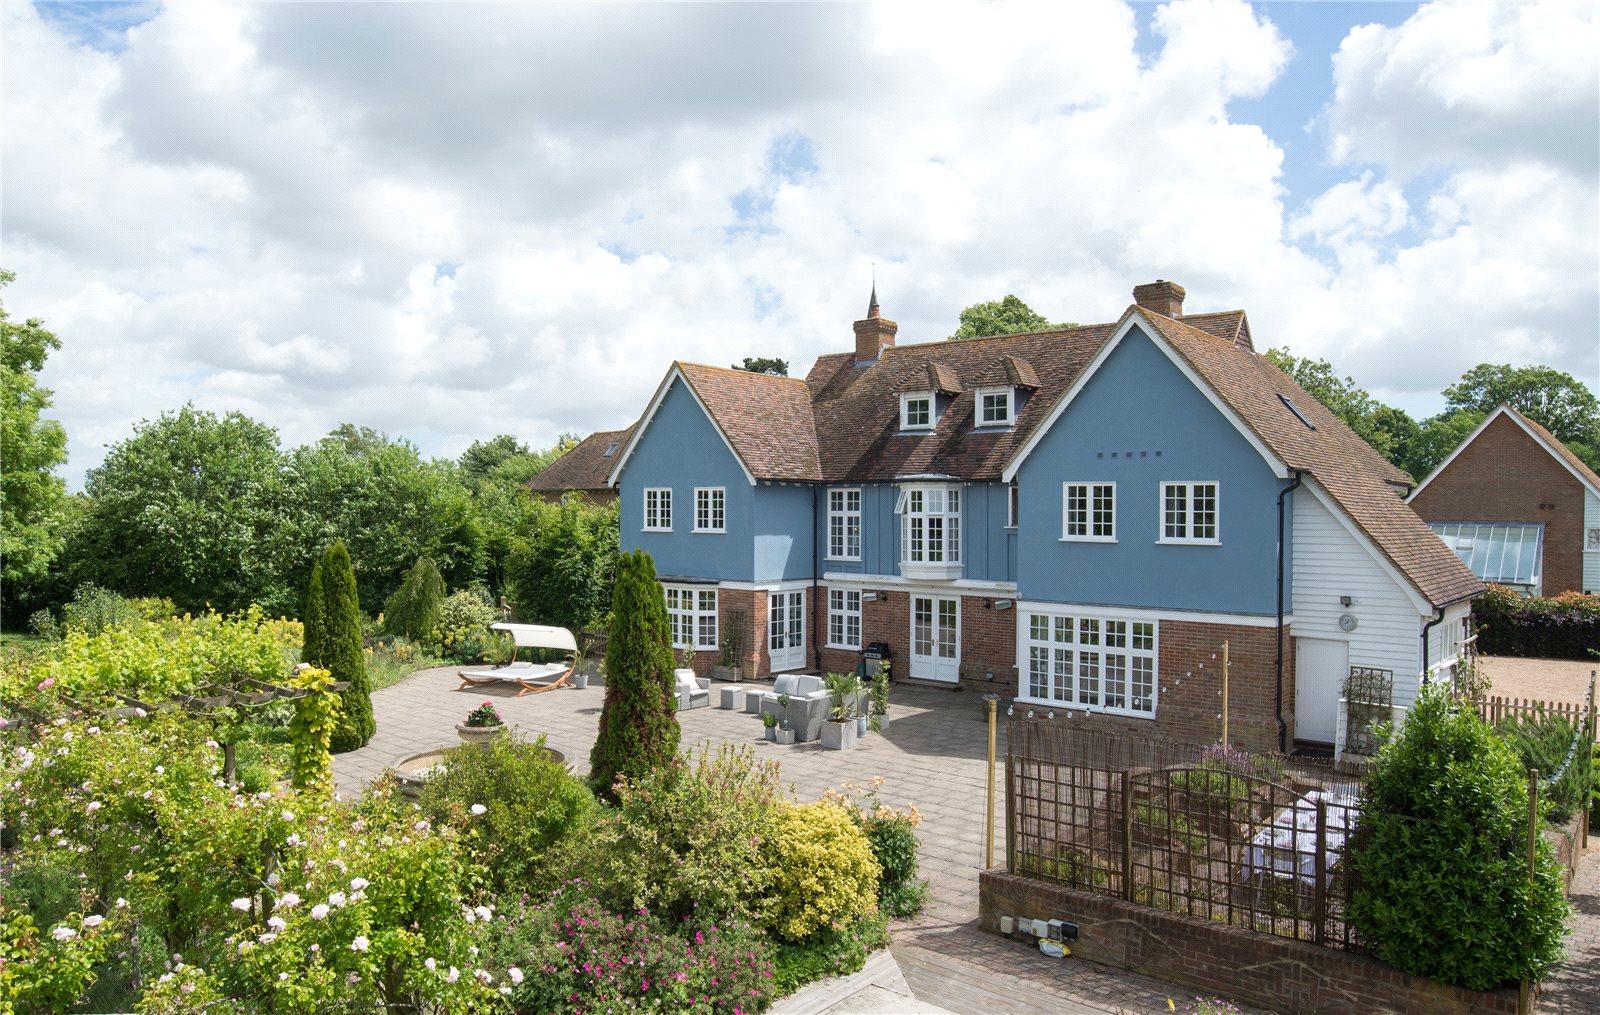 Tek Ailelik Ev için Satış at Ickham Court Farm, The Street, Ickham, Canterbury, CT3 Canterbury, Ingiltere